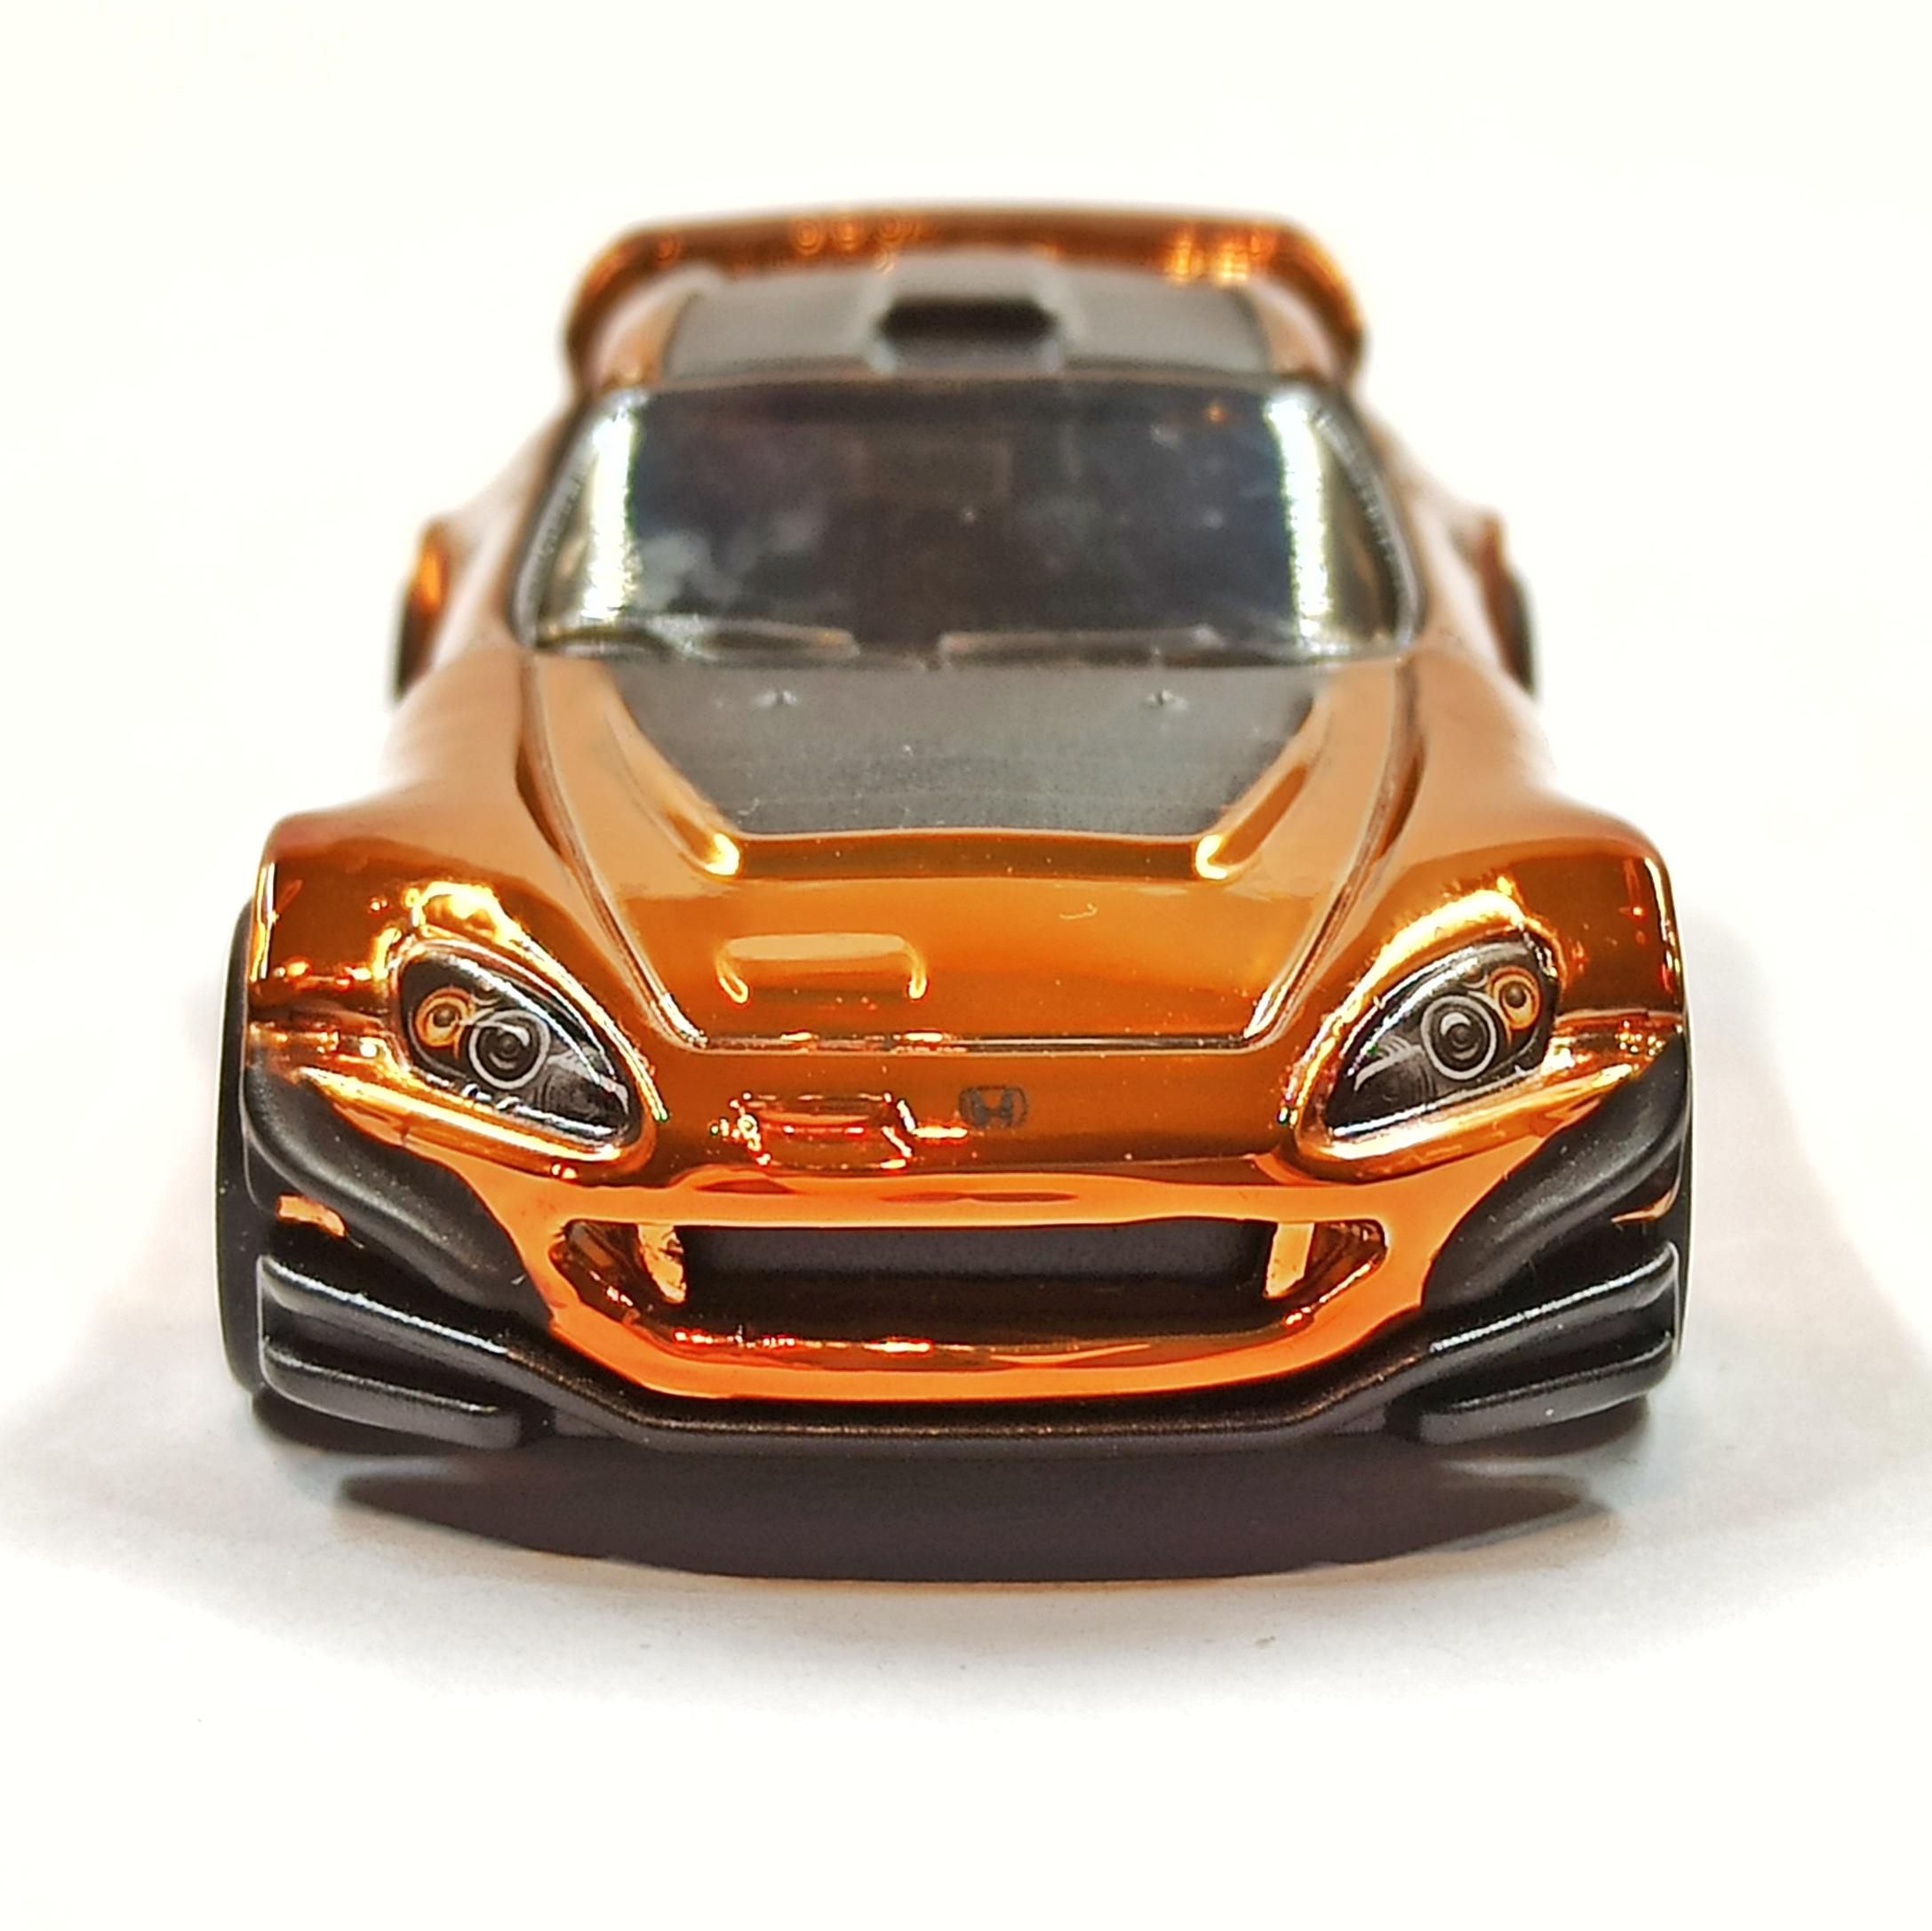 Hot Wheels Honda S2000 2019 RLC Exclusive (1 of 10.000) spectraflame orange front